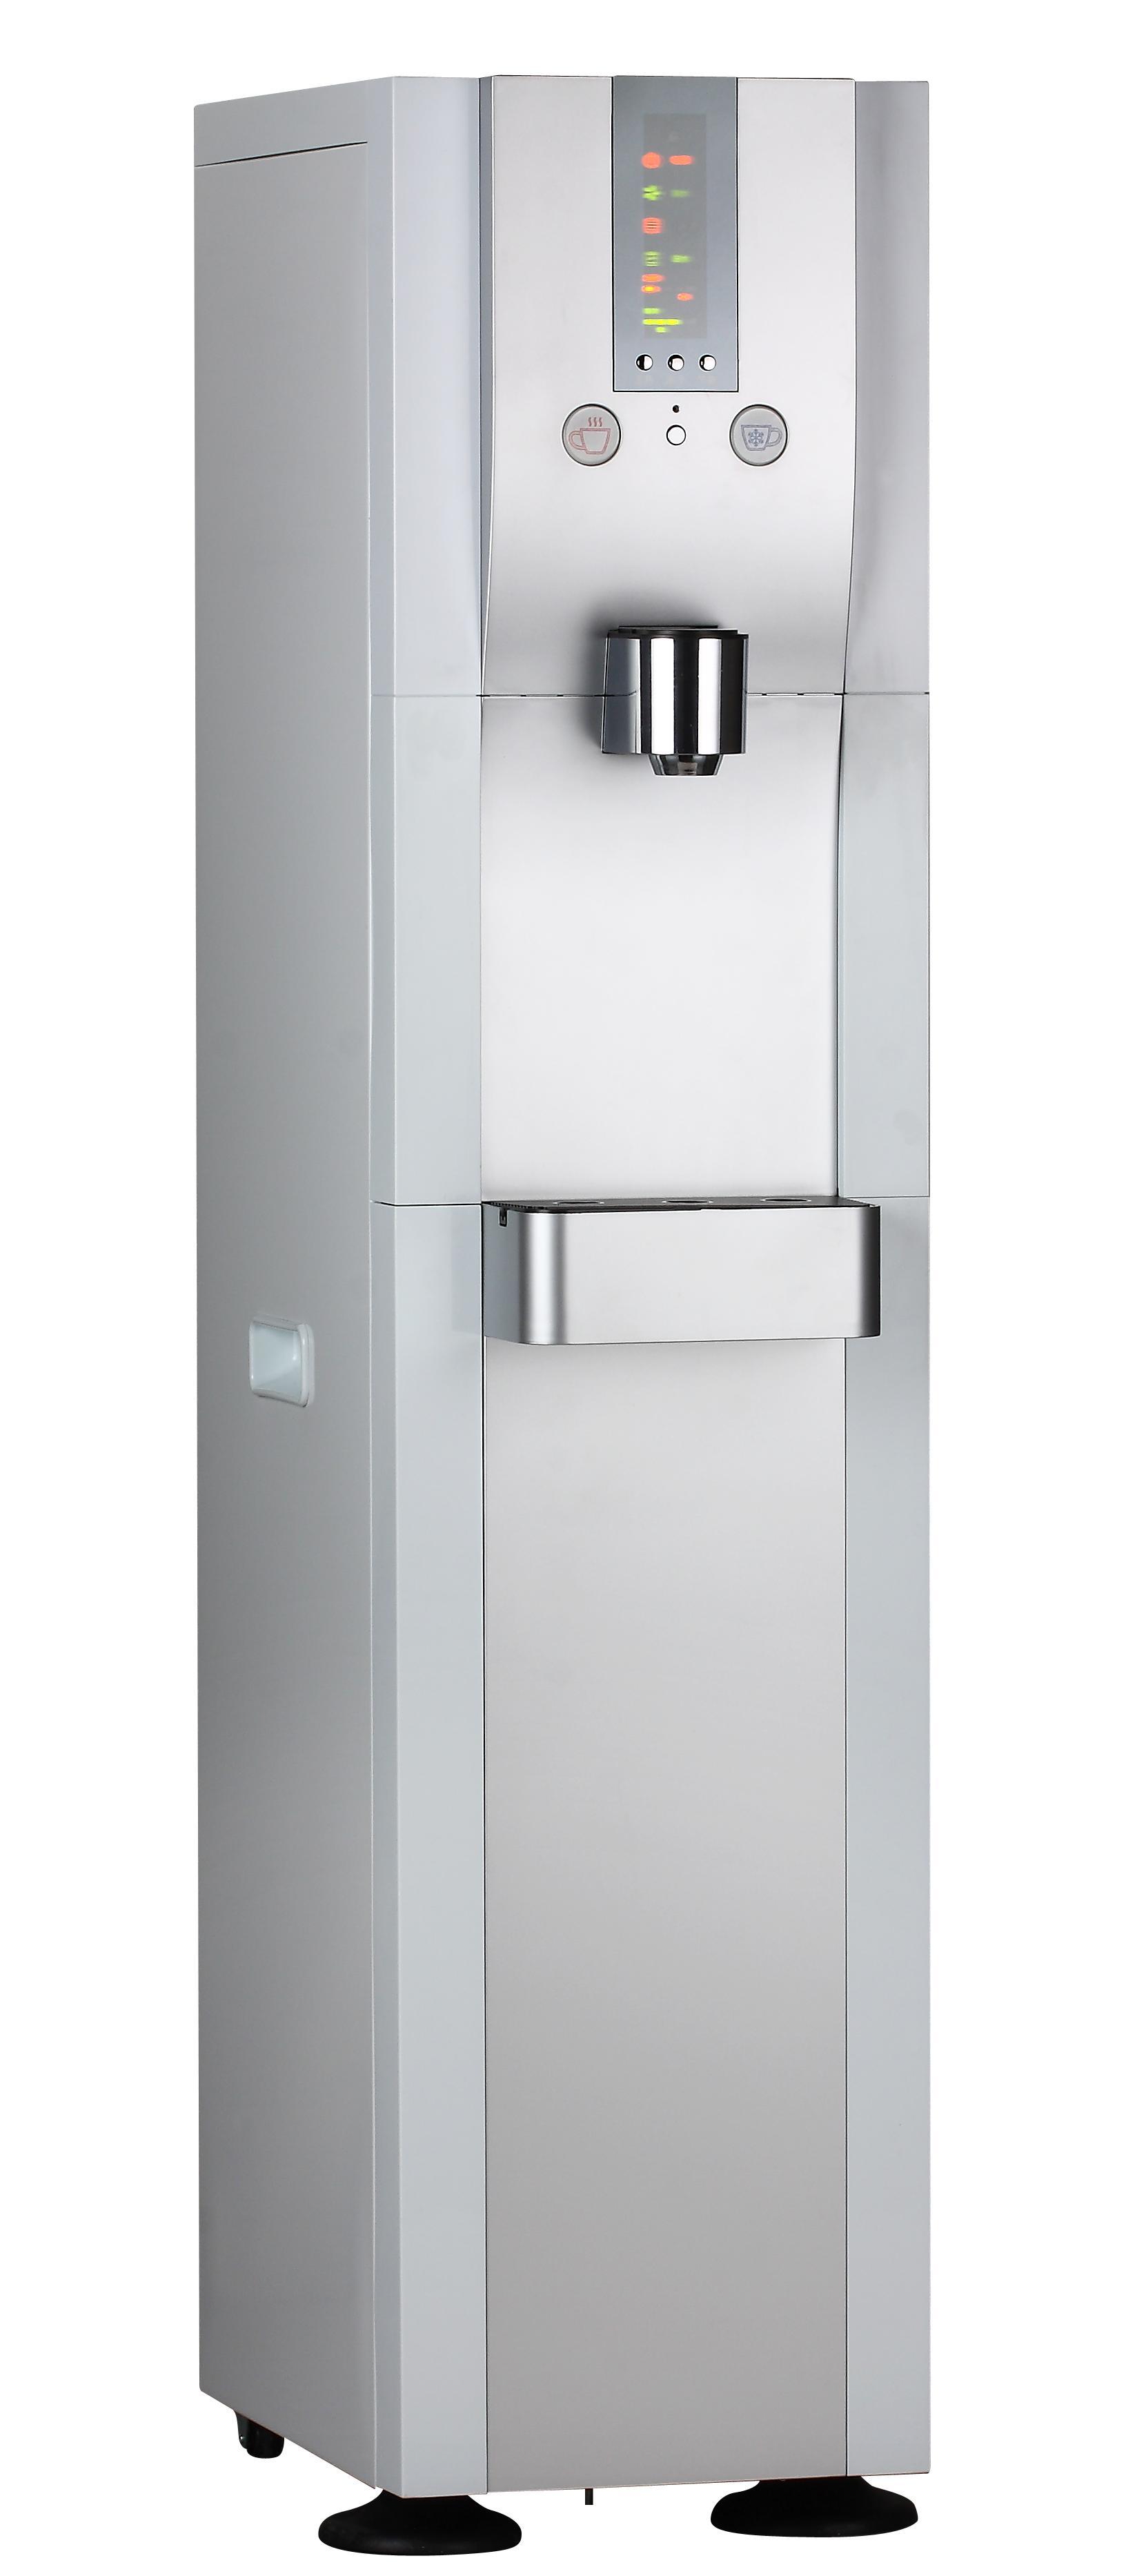 Acqua depurata per osmosi inversa idee di design per la casa - Acqua depurata in casa ...